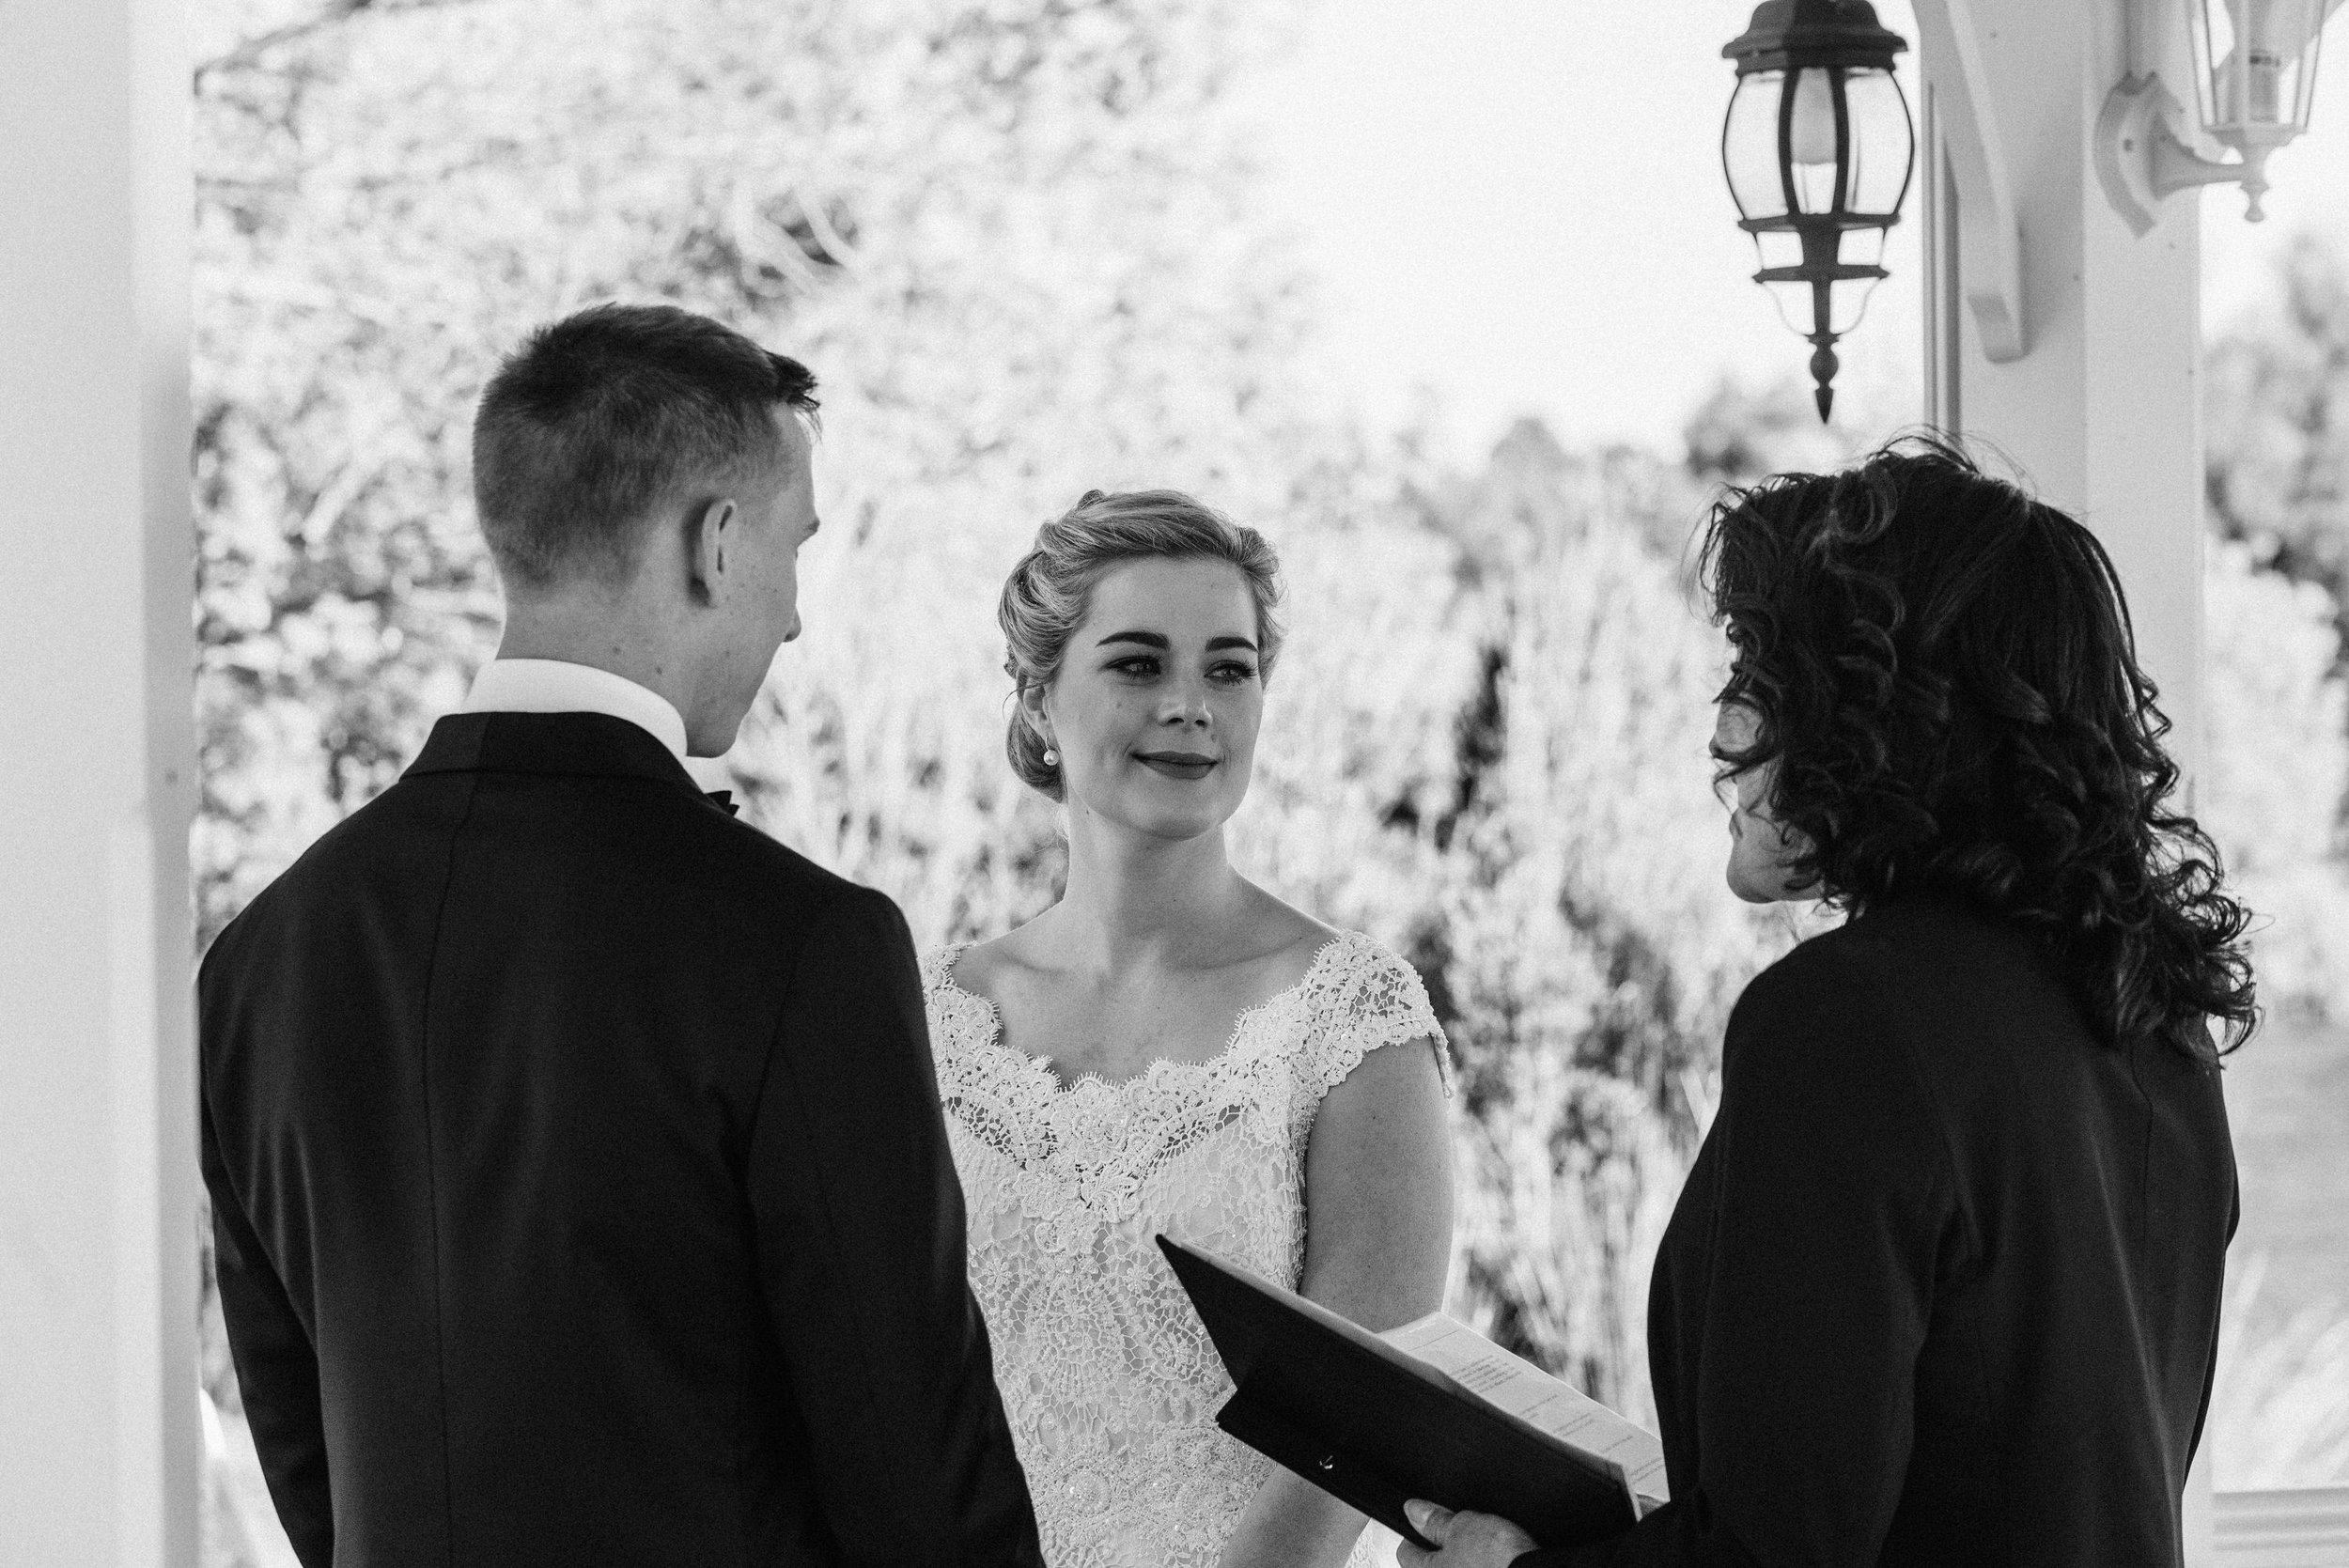 Josef-Chromy-Wedding-36.jpg